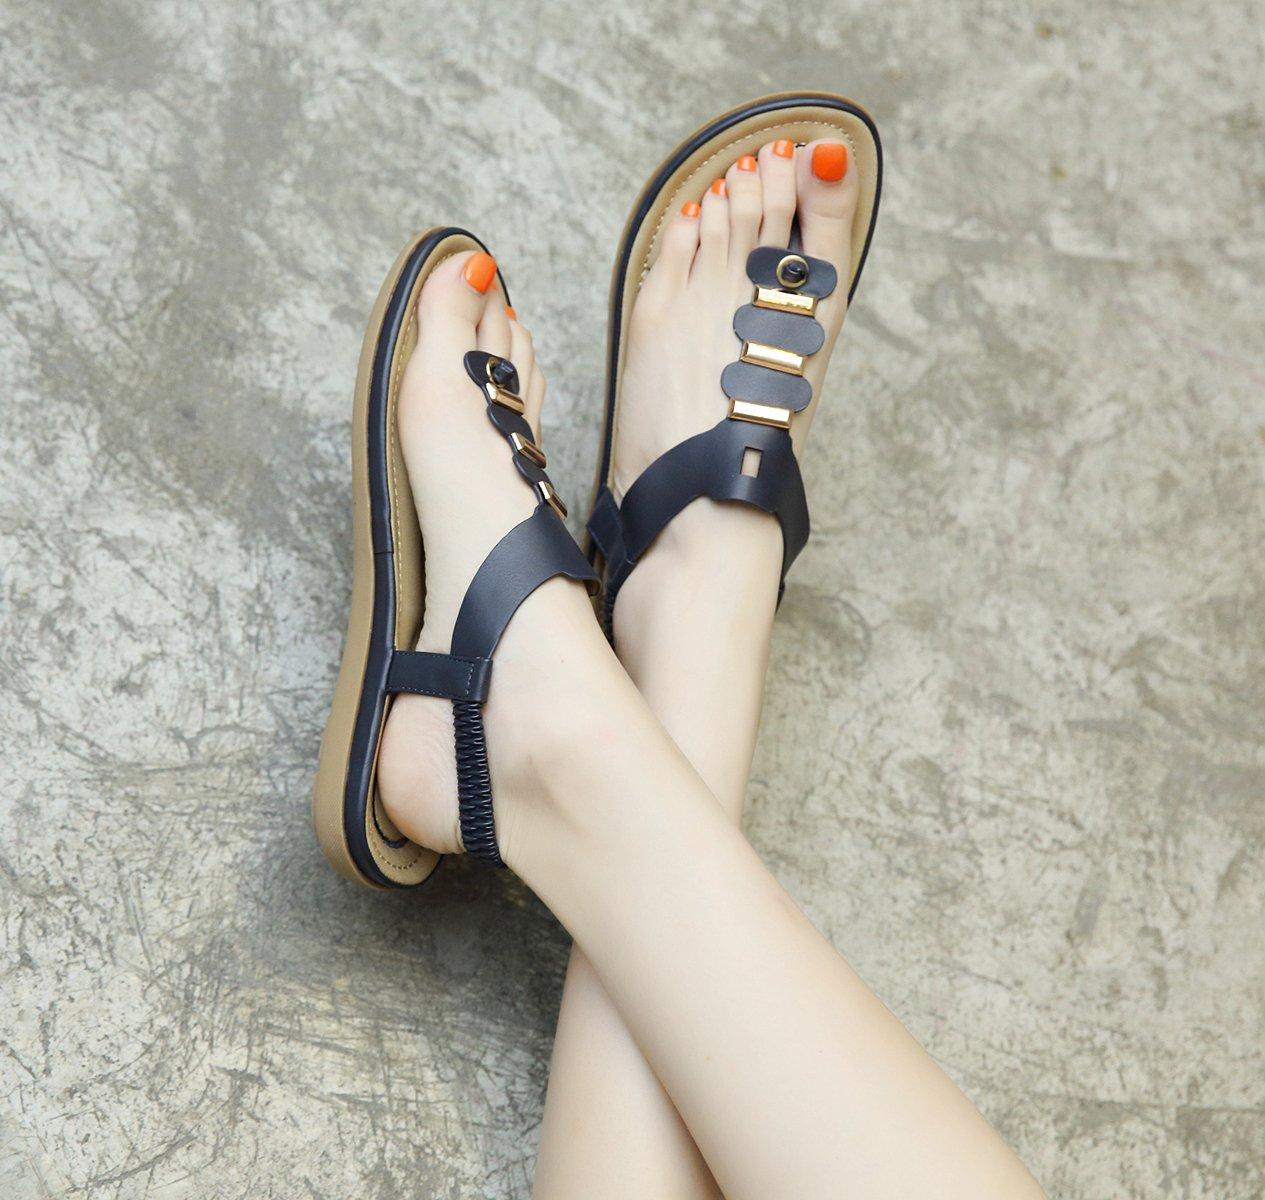 ZAMME CNPSHOE164 Damen Zehentrenner Blau2018 Schuhe Letztes Modell  Mode Schuhe Blau2018 Billig Online-Verkauf 2536ad